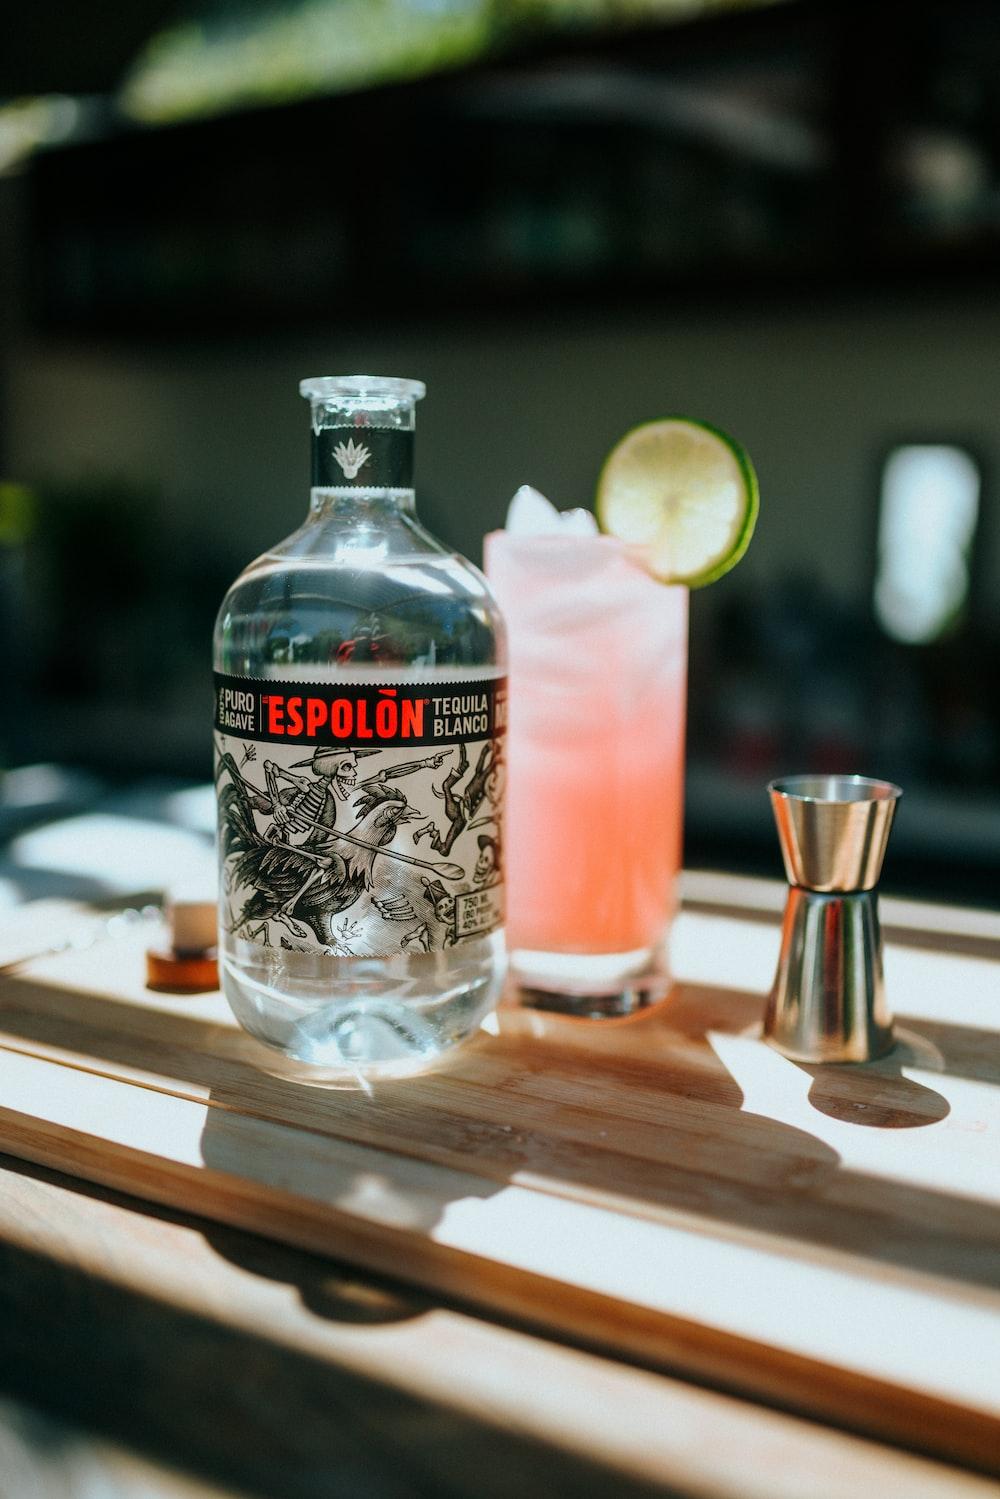 Espolòn Tequila bottle beside Paloma